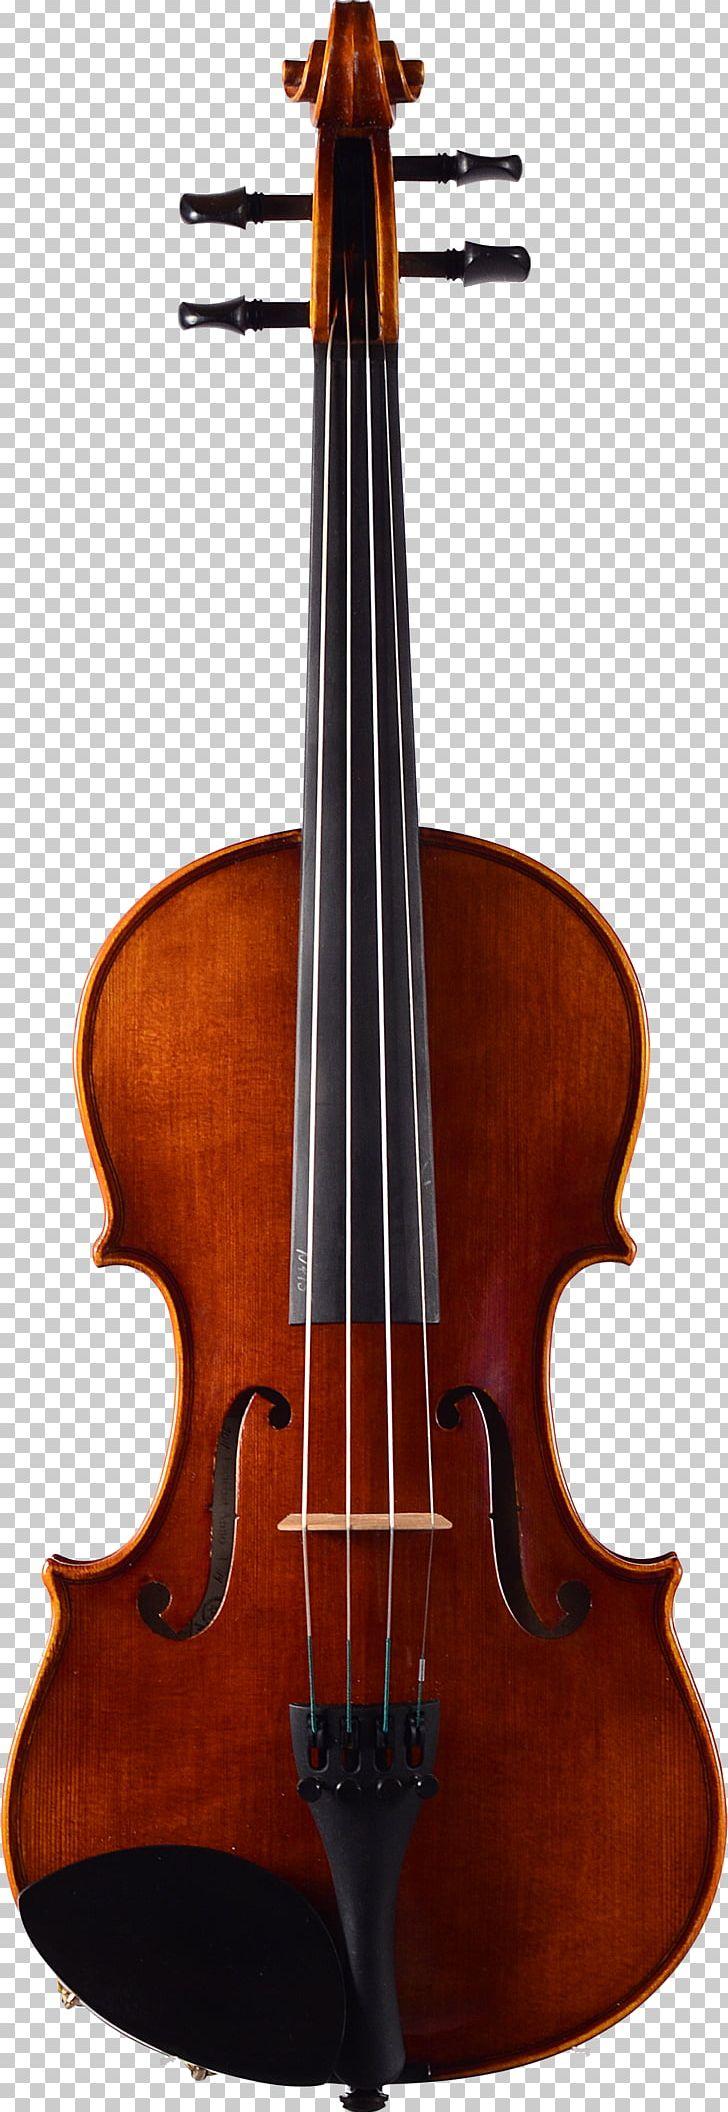 Viola Violin Musical Instruments String Instruments Cello PNG, Clipart, Acoustic Electric Guitar, Amati, Antonio Stradivari, Bass Guitar, Bow Free PNG Download